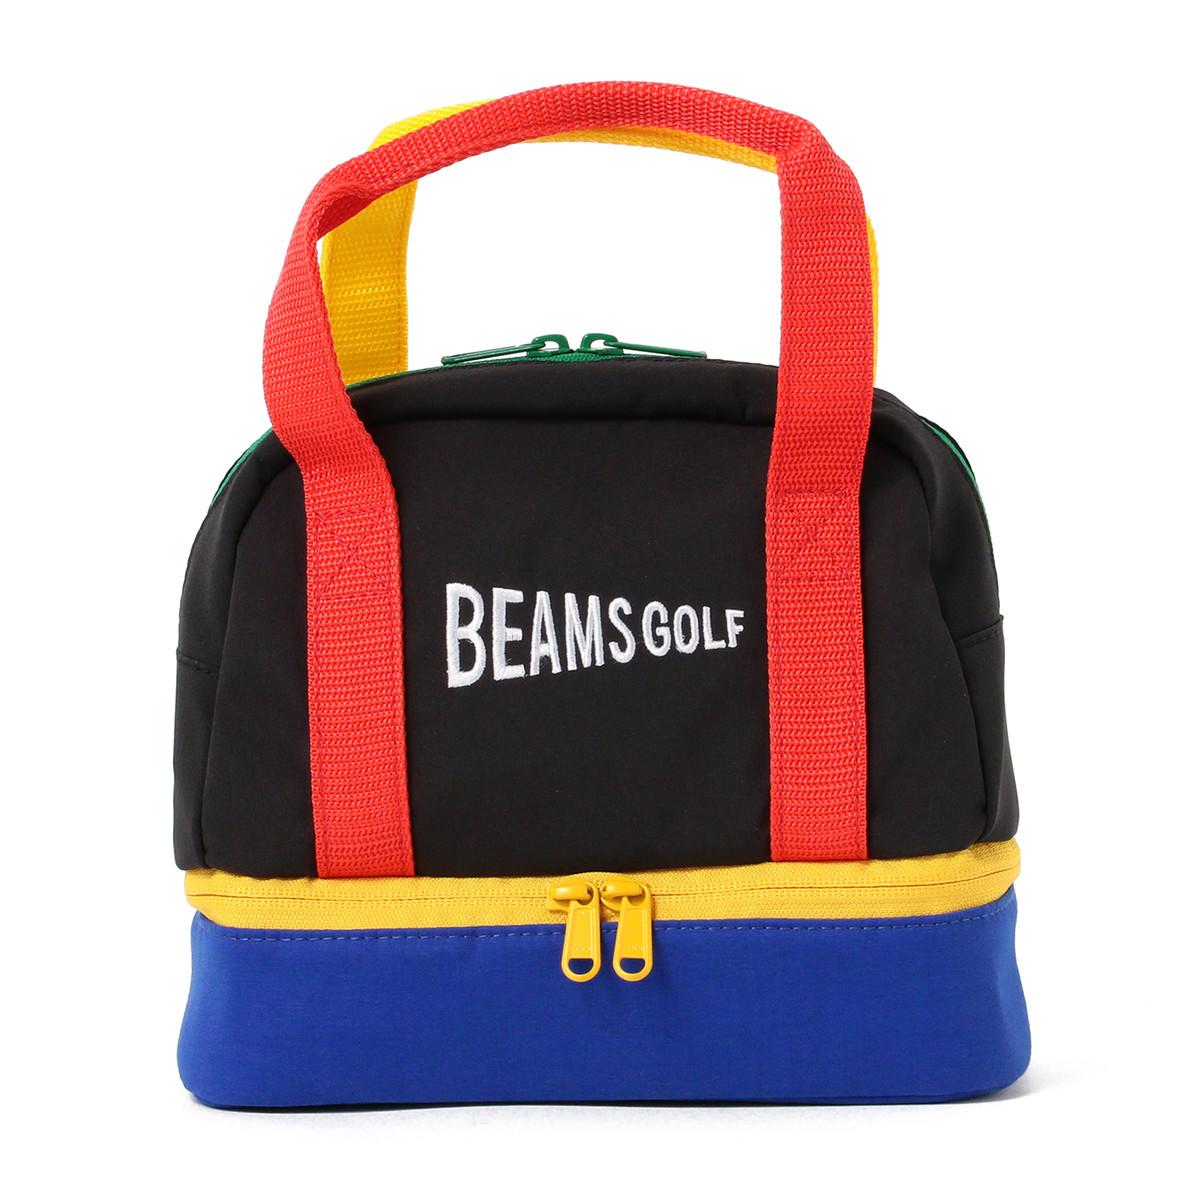 BEAMS GOLF 保冷付き カートバッグ